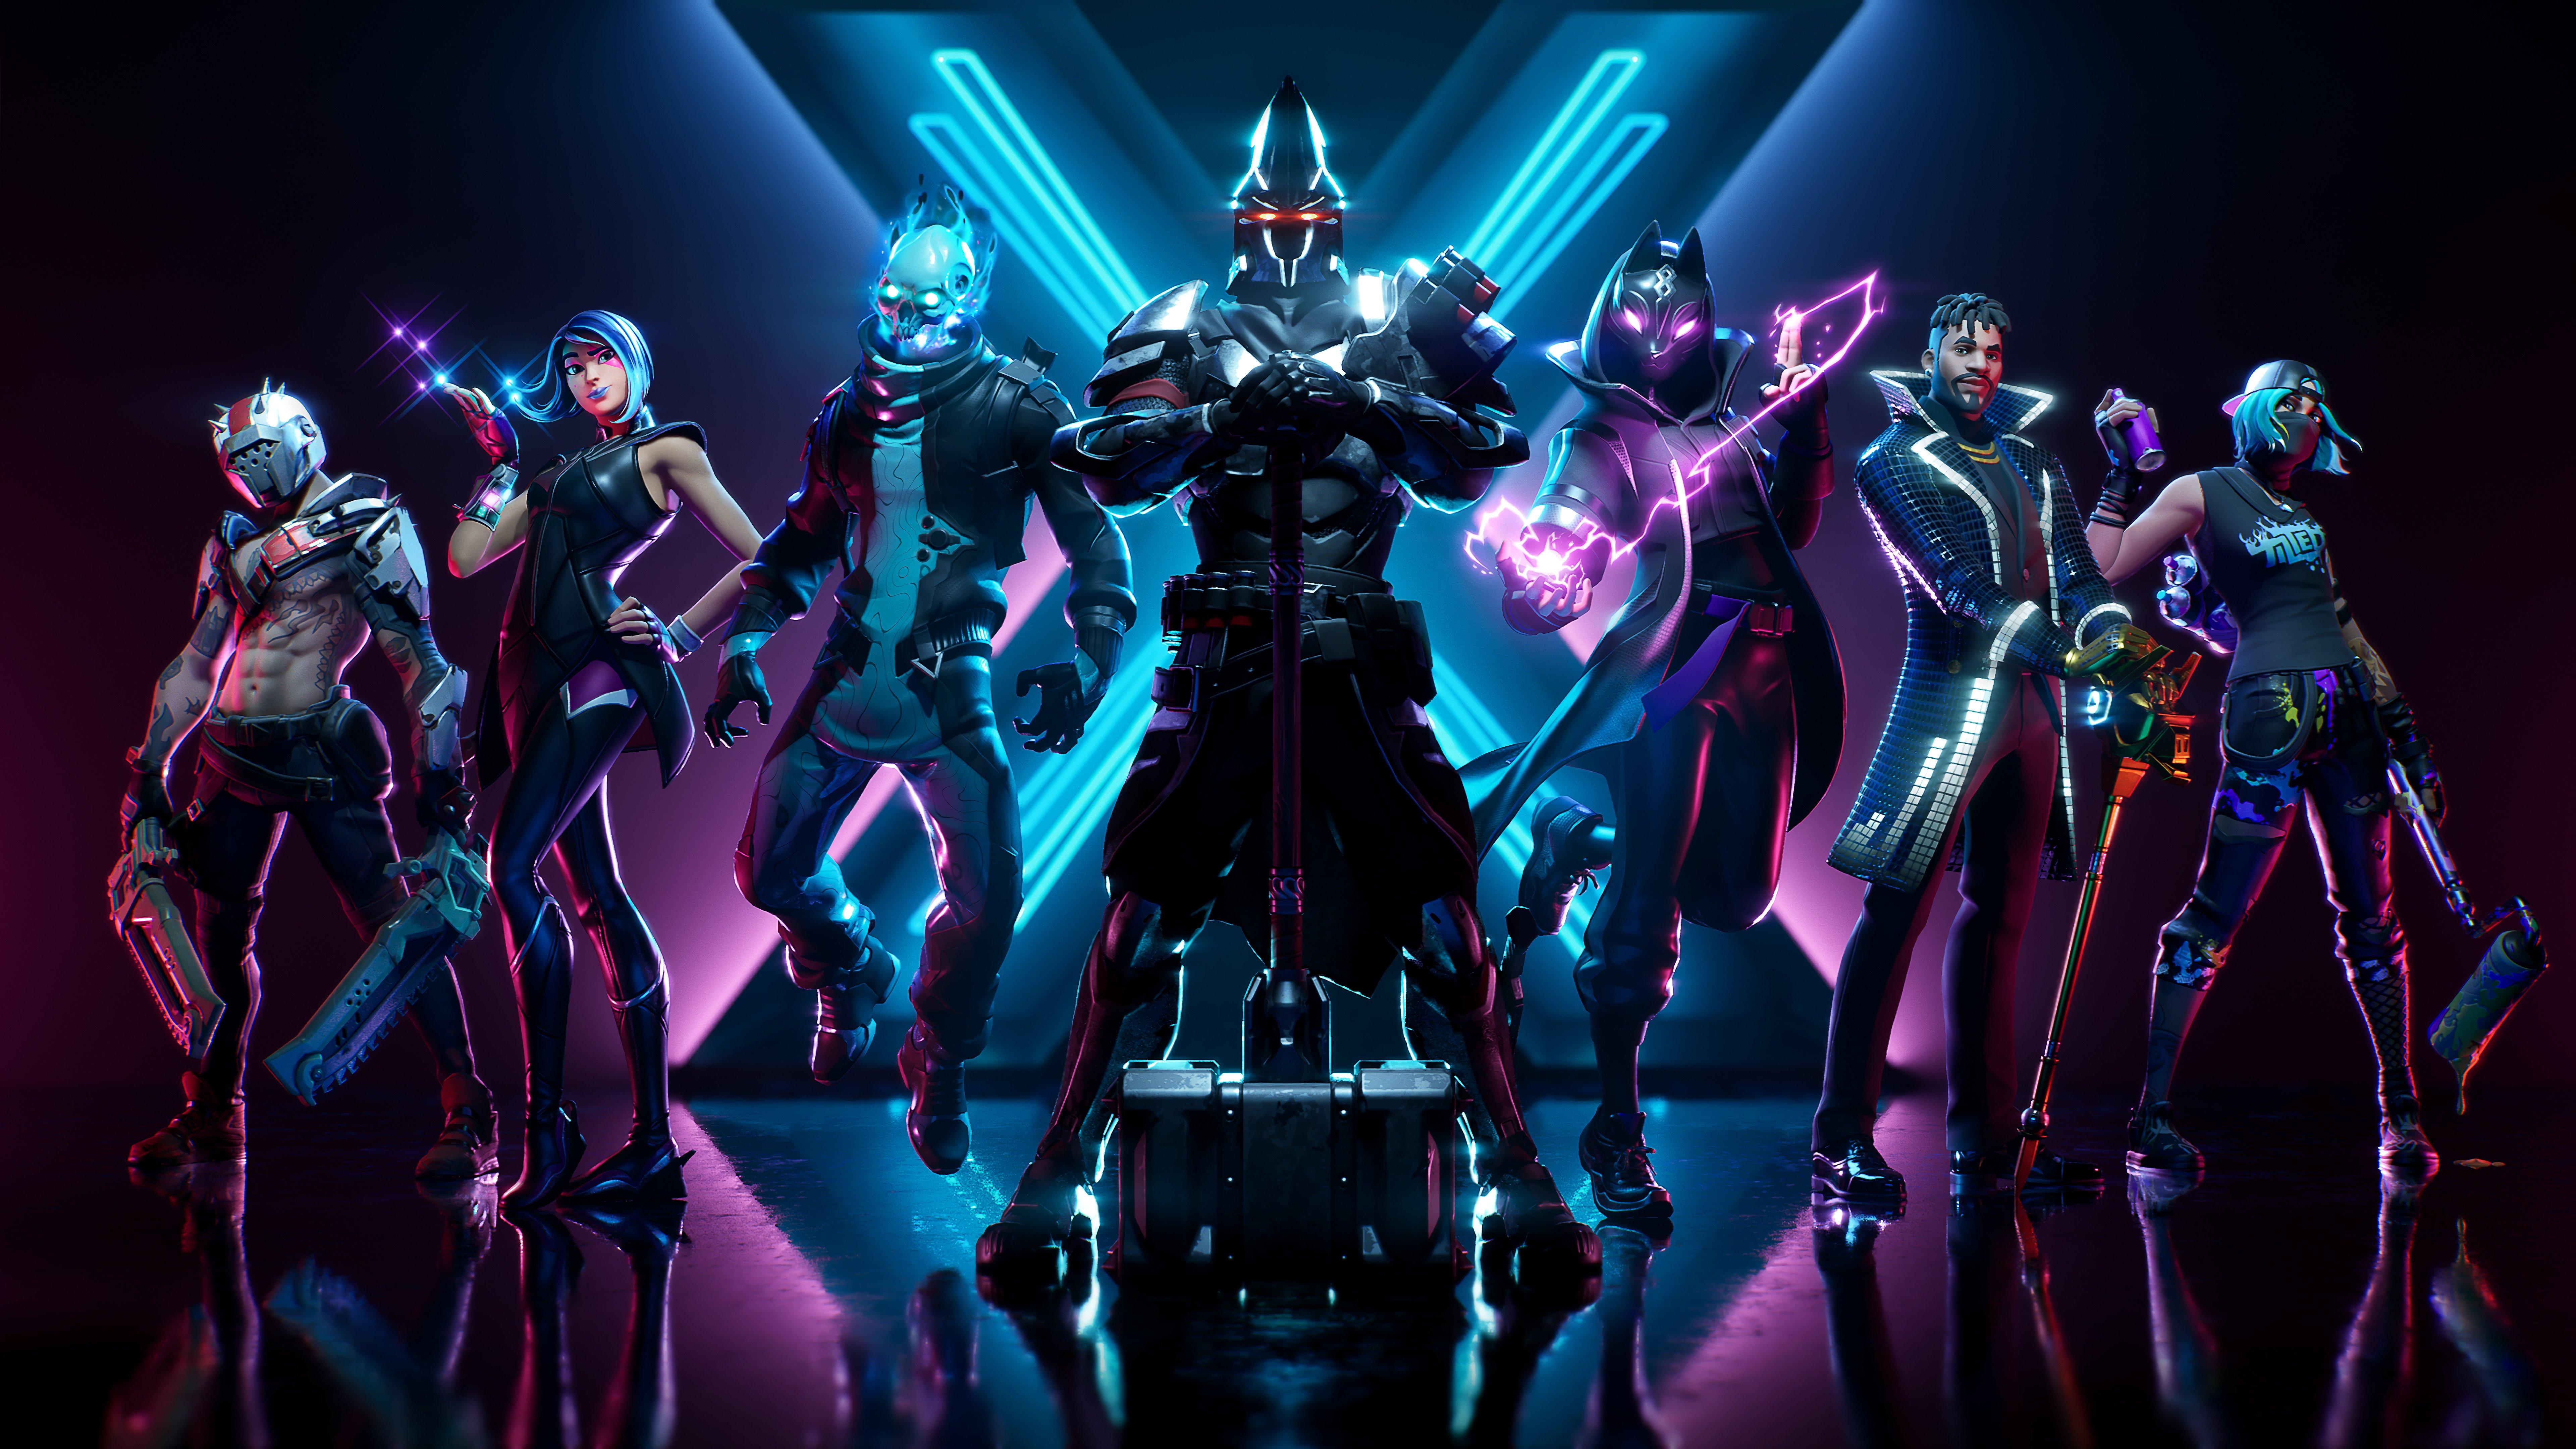 Fondos de pantalla Fortnite X Todos los trajes de Battle Pass Skins Season 10